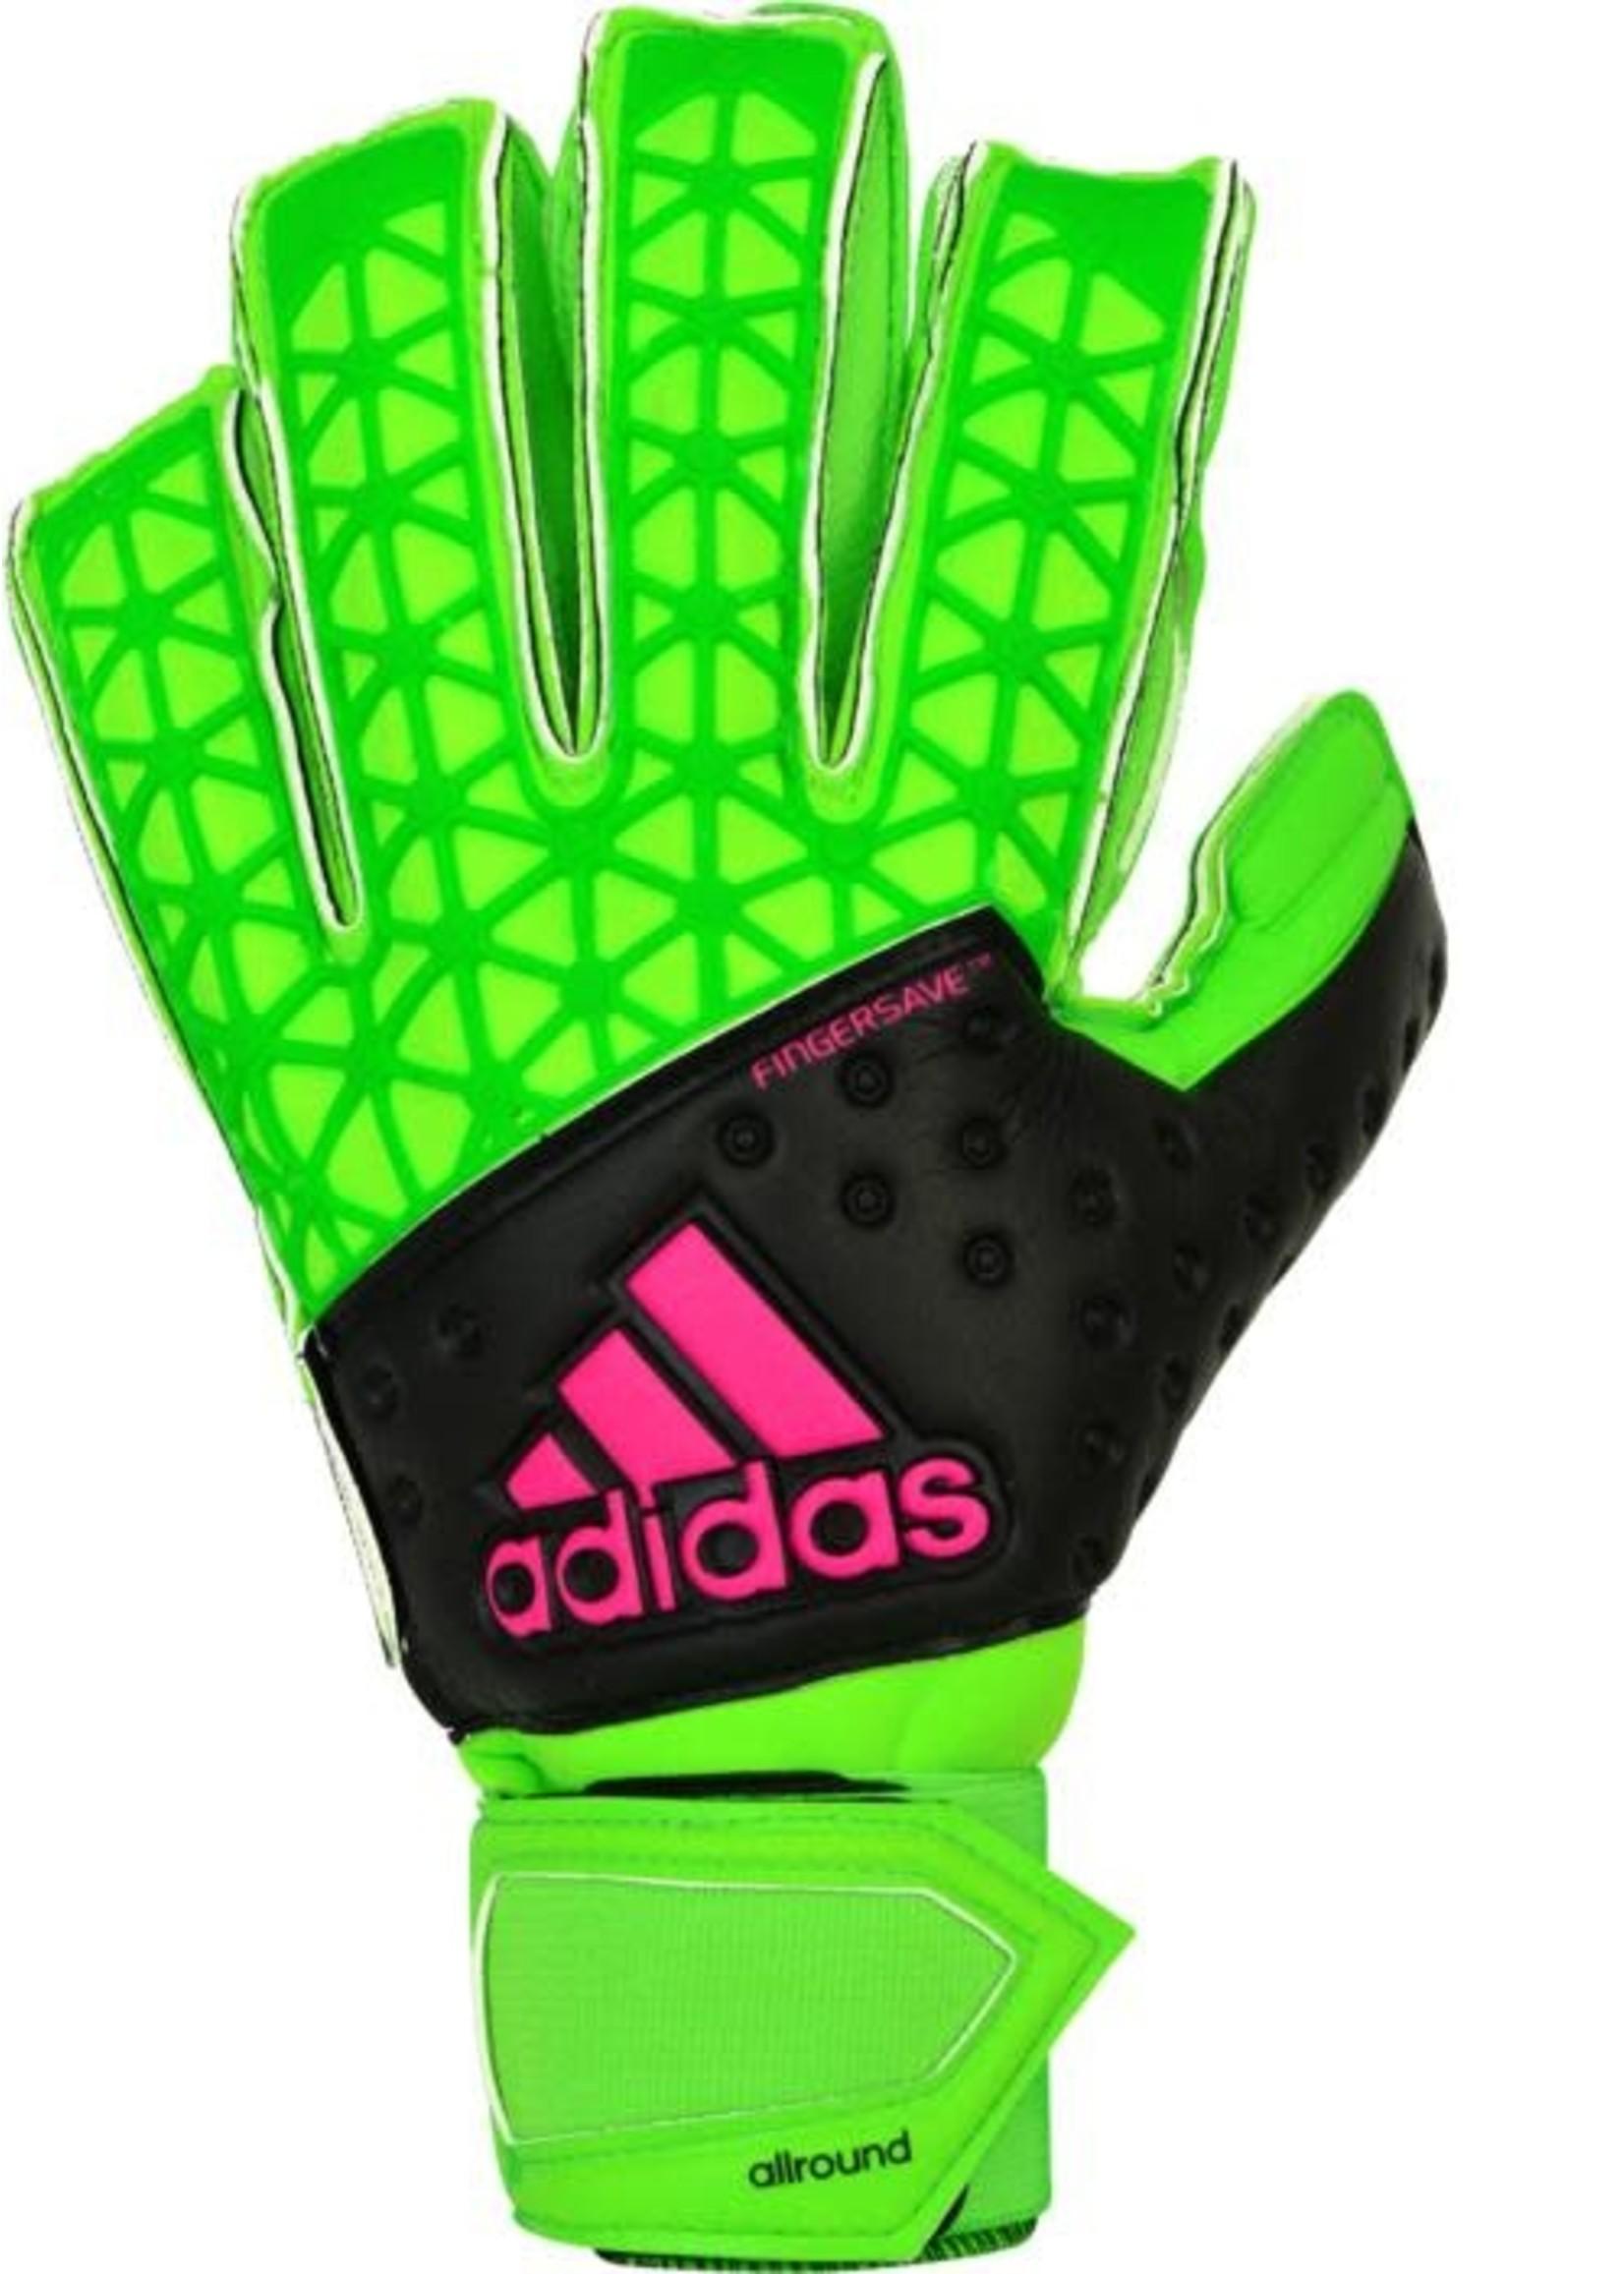 Adidas ACE Zones Fingersave Allround